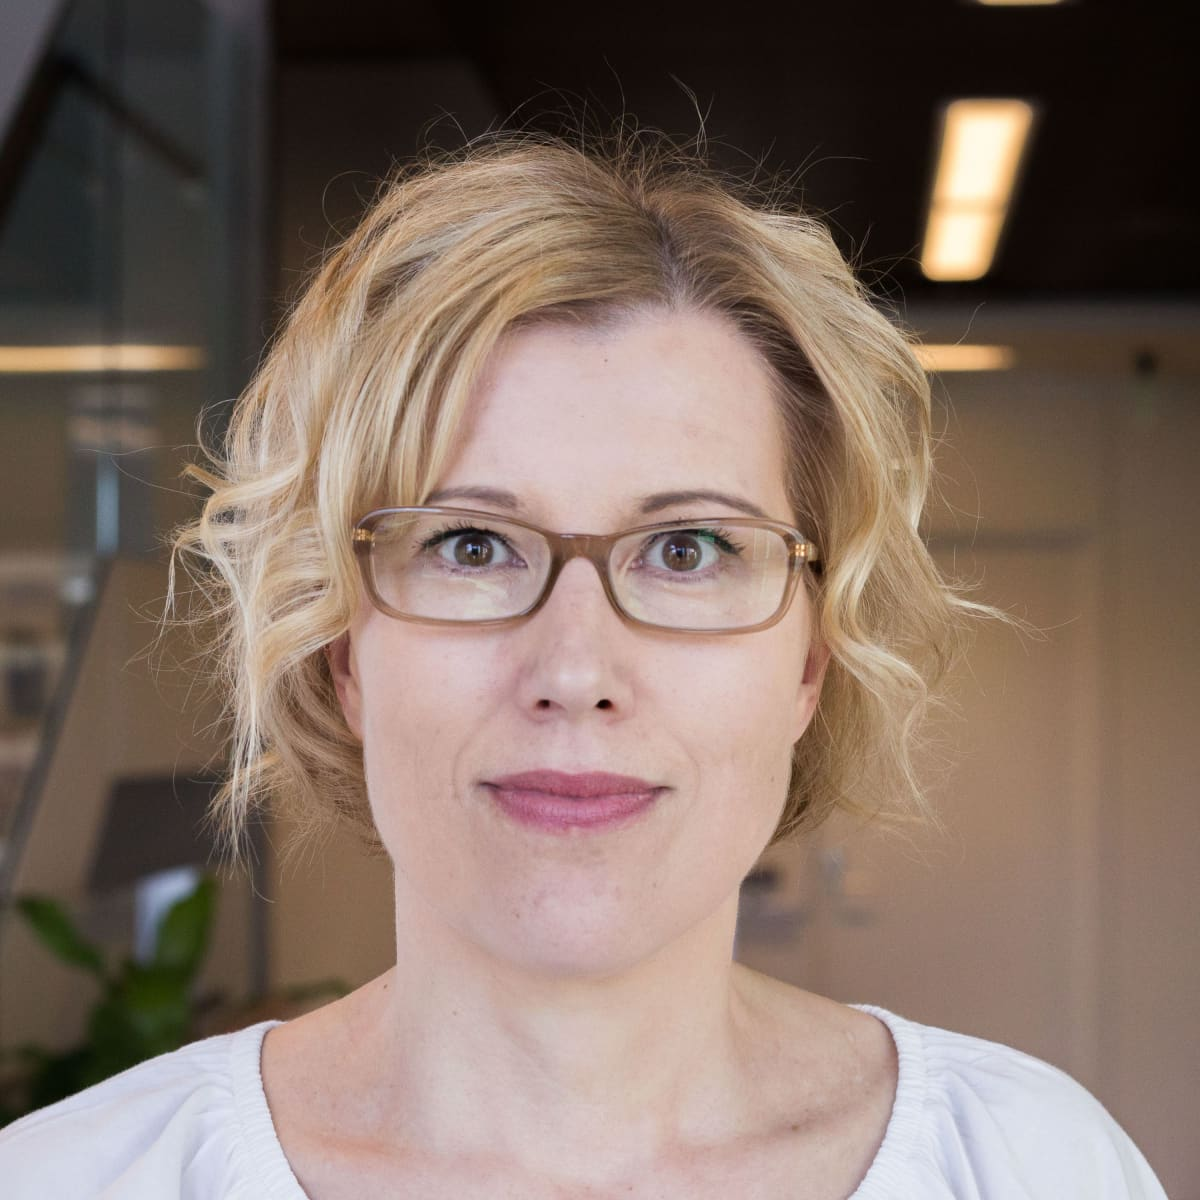 Hanna Nori